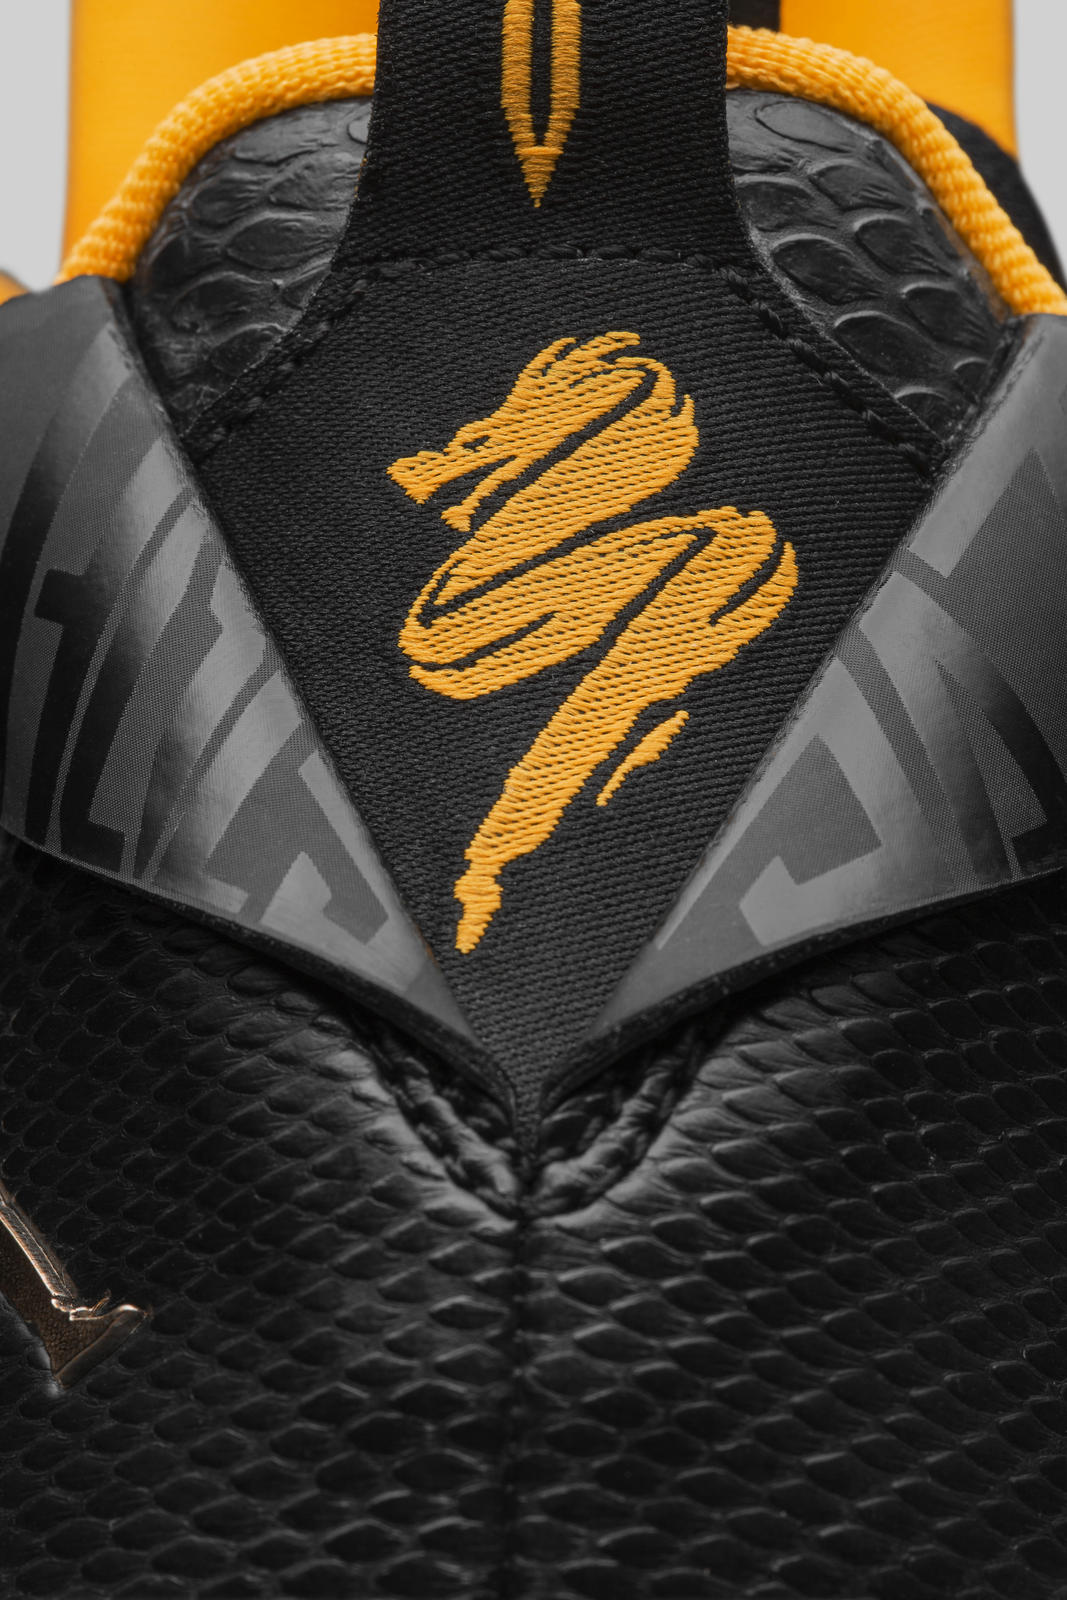 Jordan CP3.IX yellow dragon heel logo